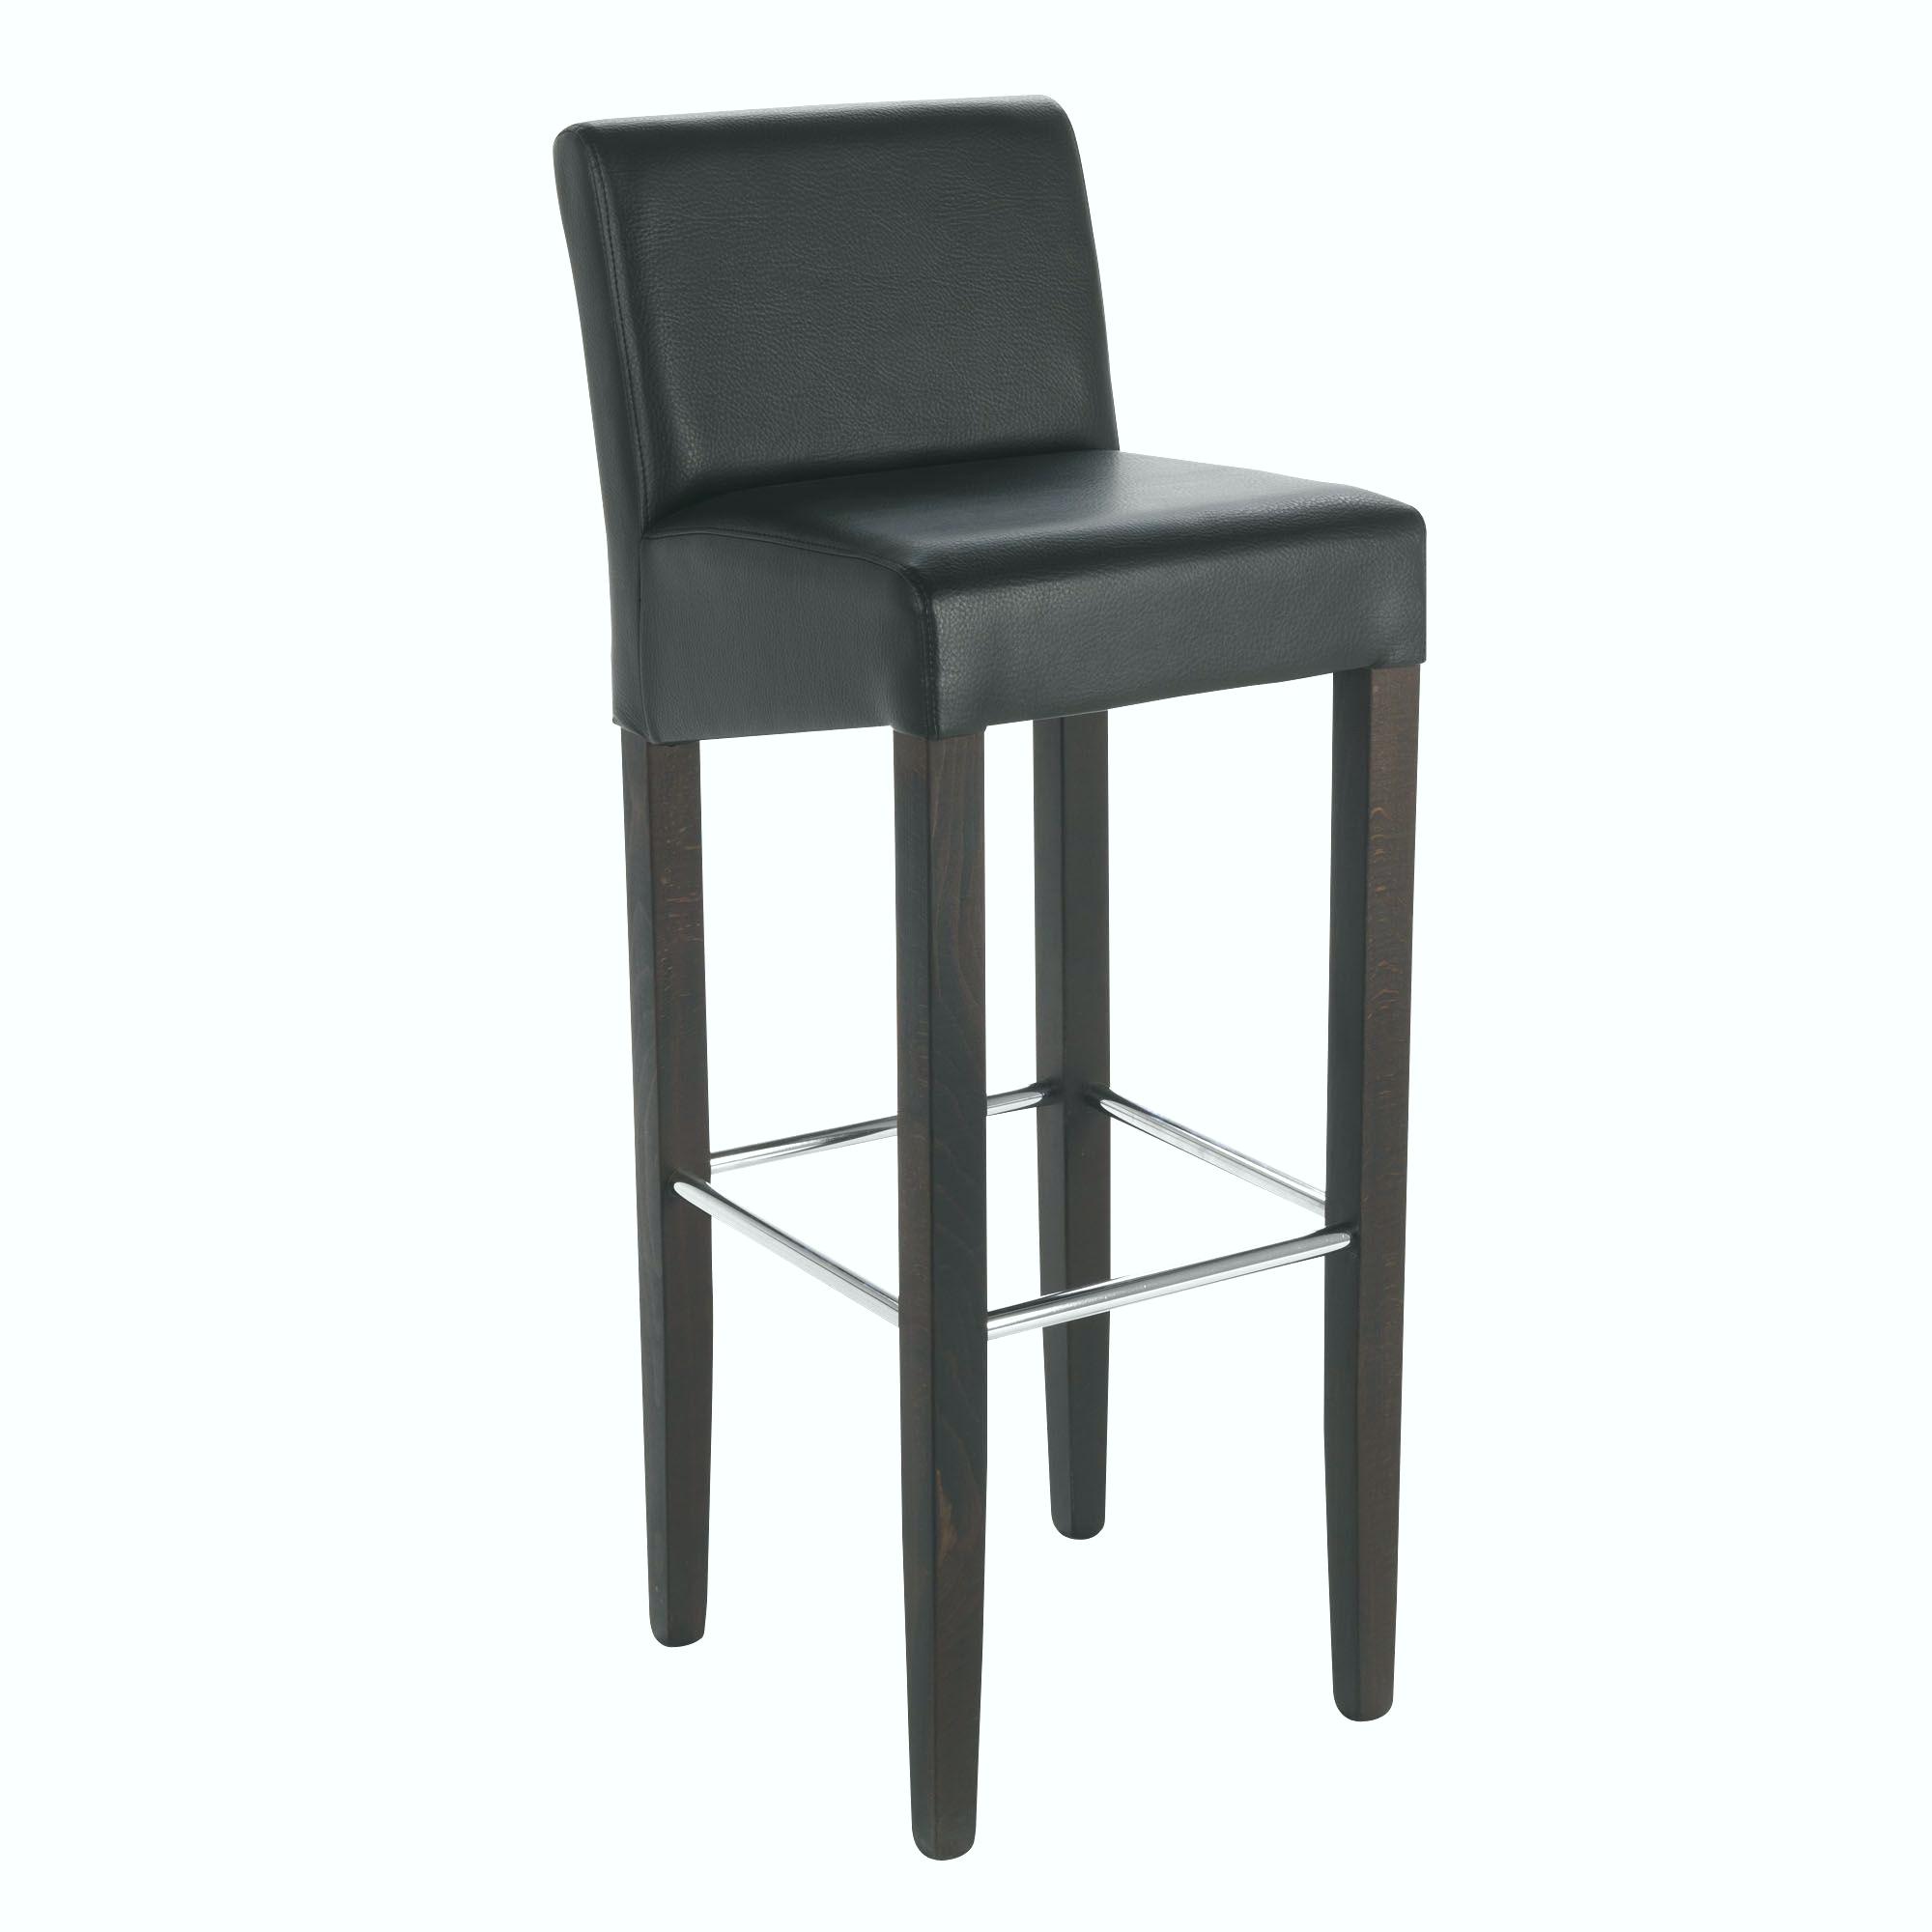 Table Cuisine Conforama Luxe Collection Table Tabouret Inspirant Ikea Chaise Bar élégant Chaises Conforama